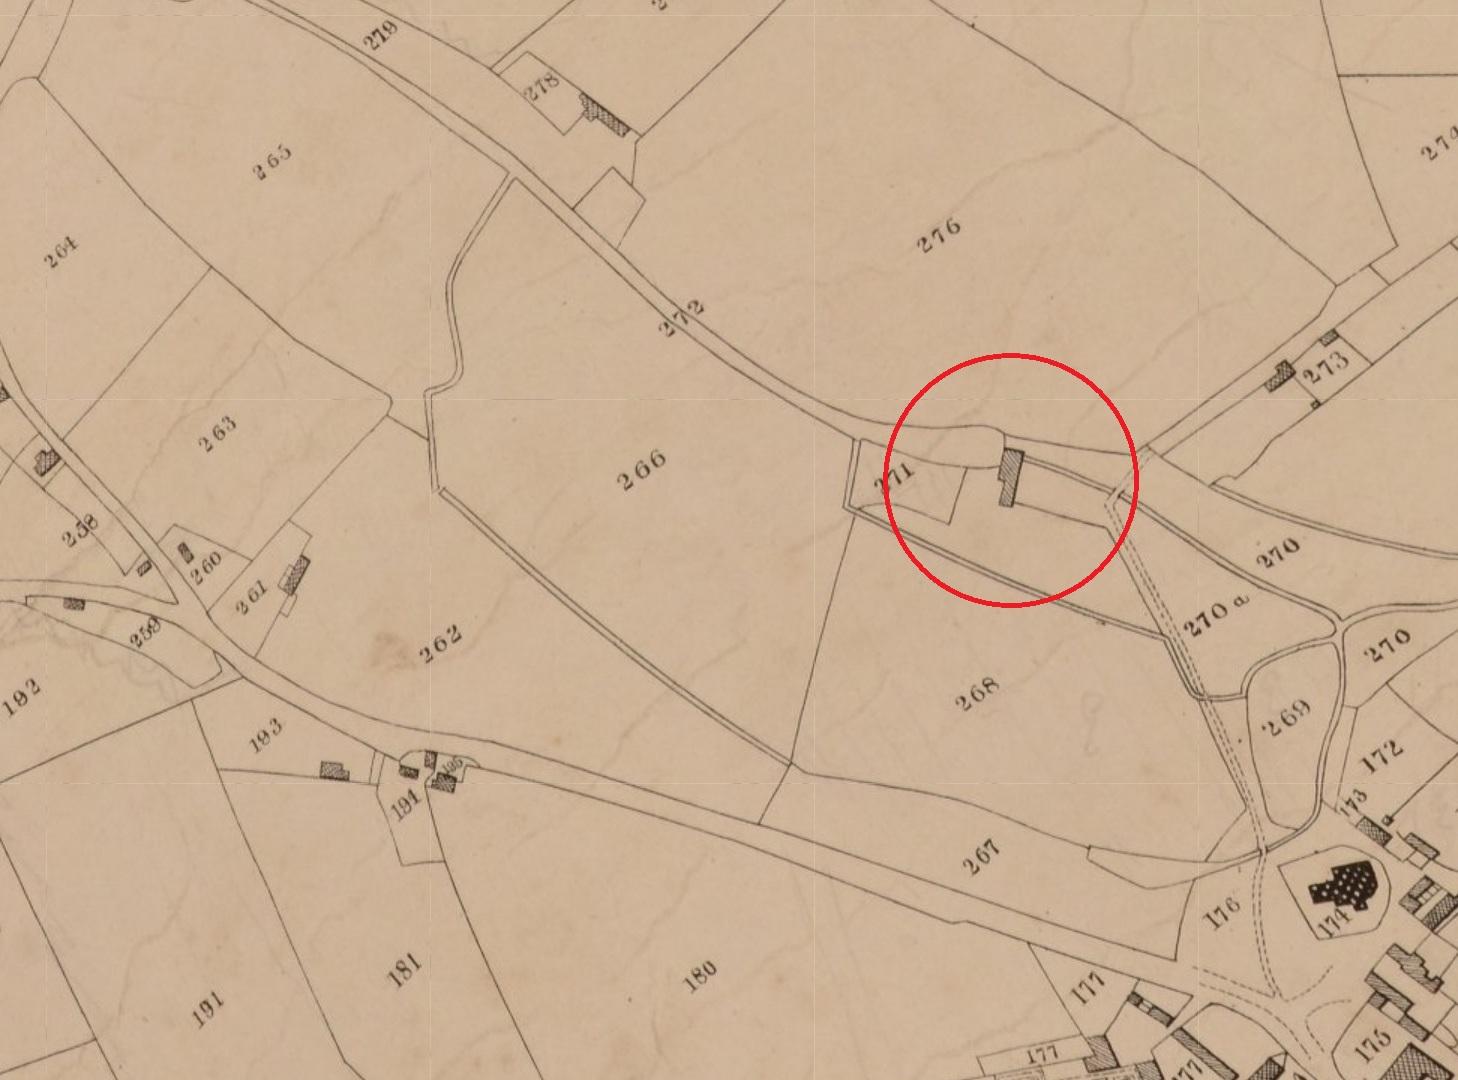 Roath Tithe map of 1840